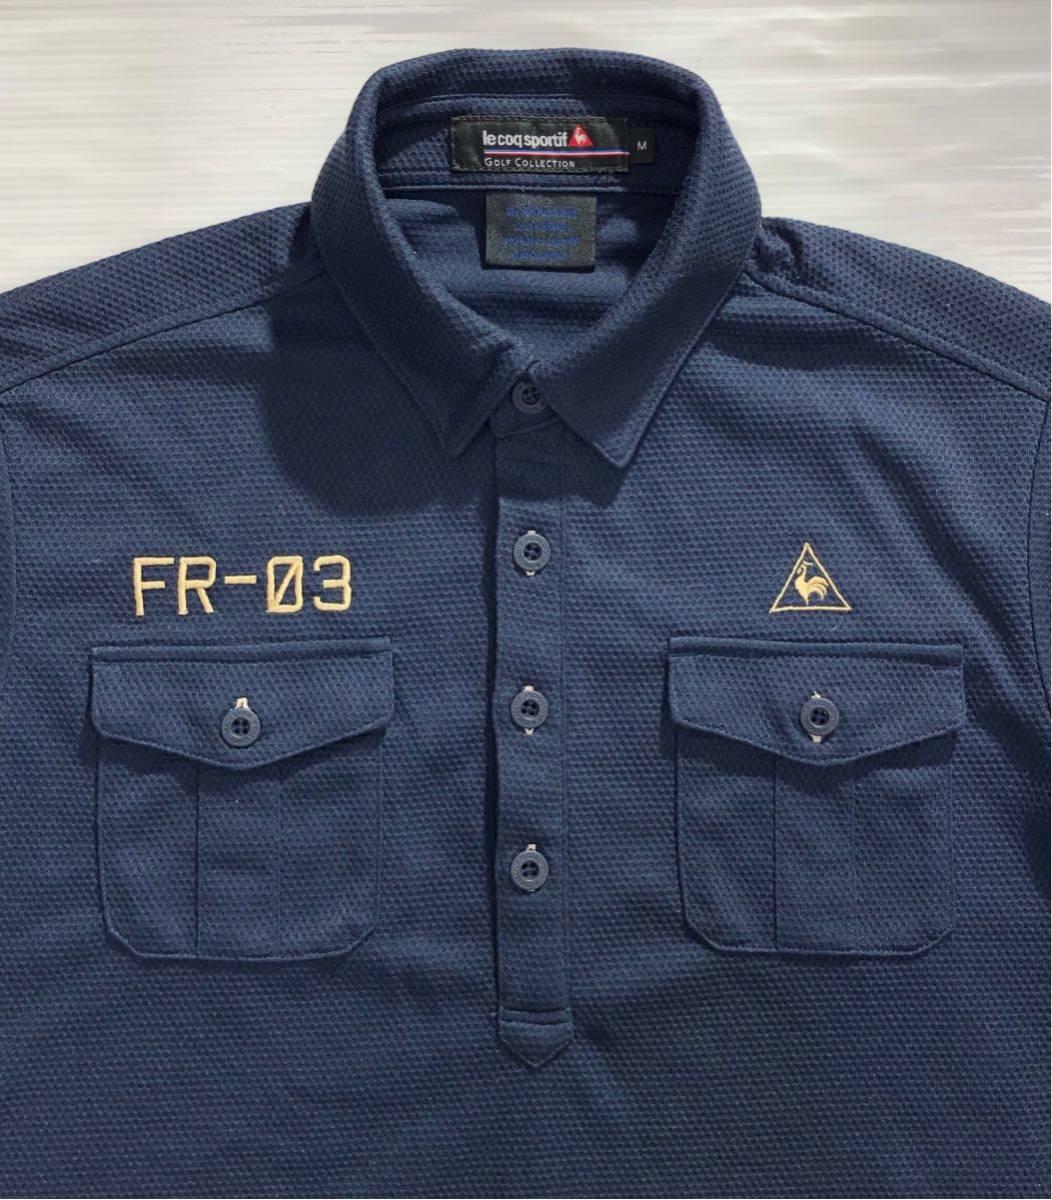 《le coq sportif GOLF ルコックゴルフ》ロゴ FR-03刺繍 半袖 ポロシャツ ネイビー M_画像4